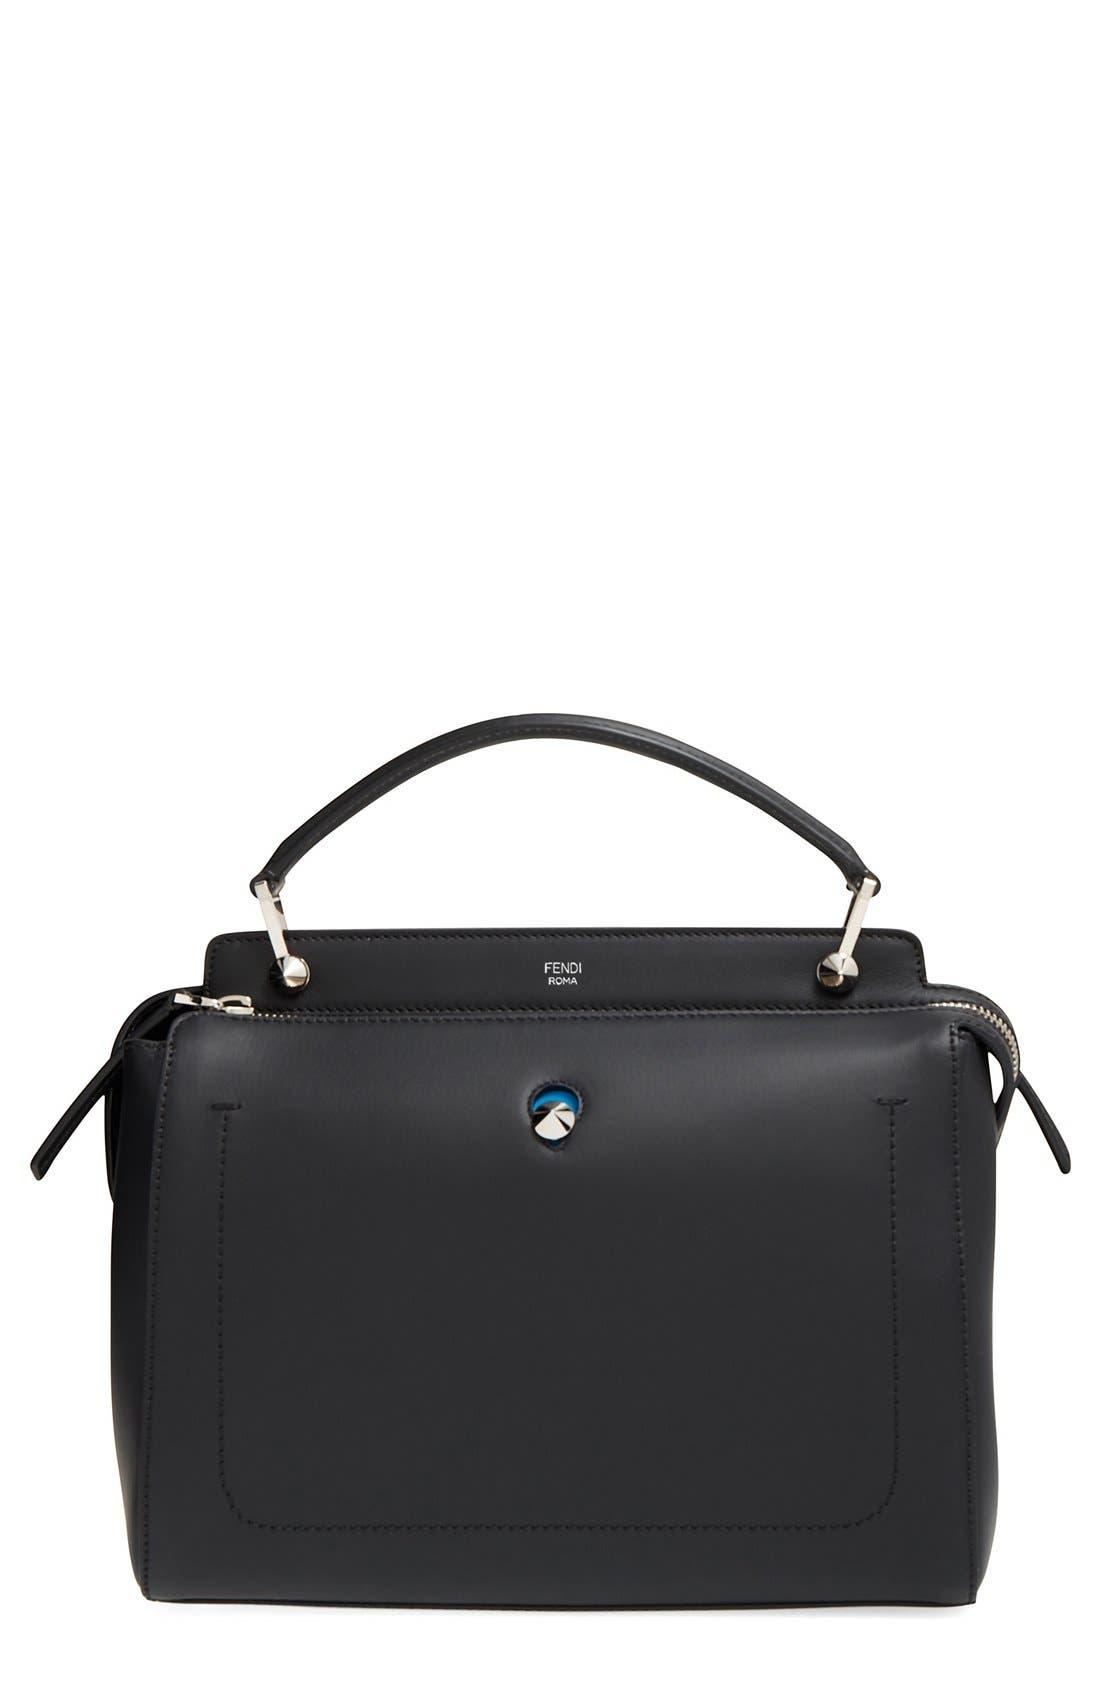 'DOTCOM' Leather Satchel,                         Main,                         color, BLACK/ ROYAL BLUE